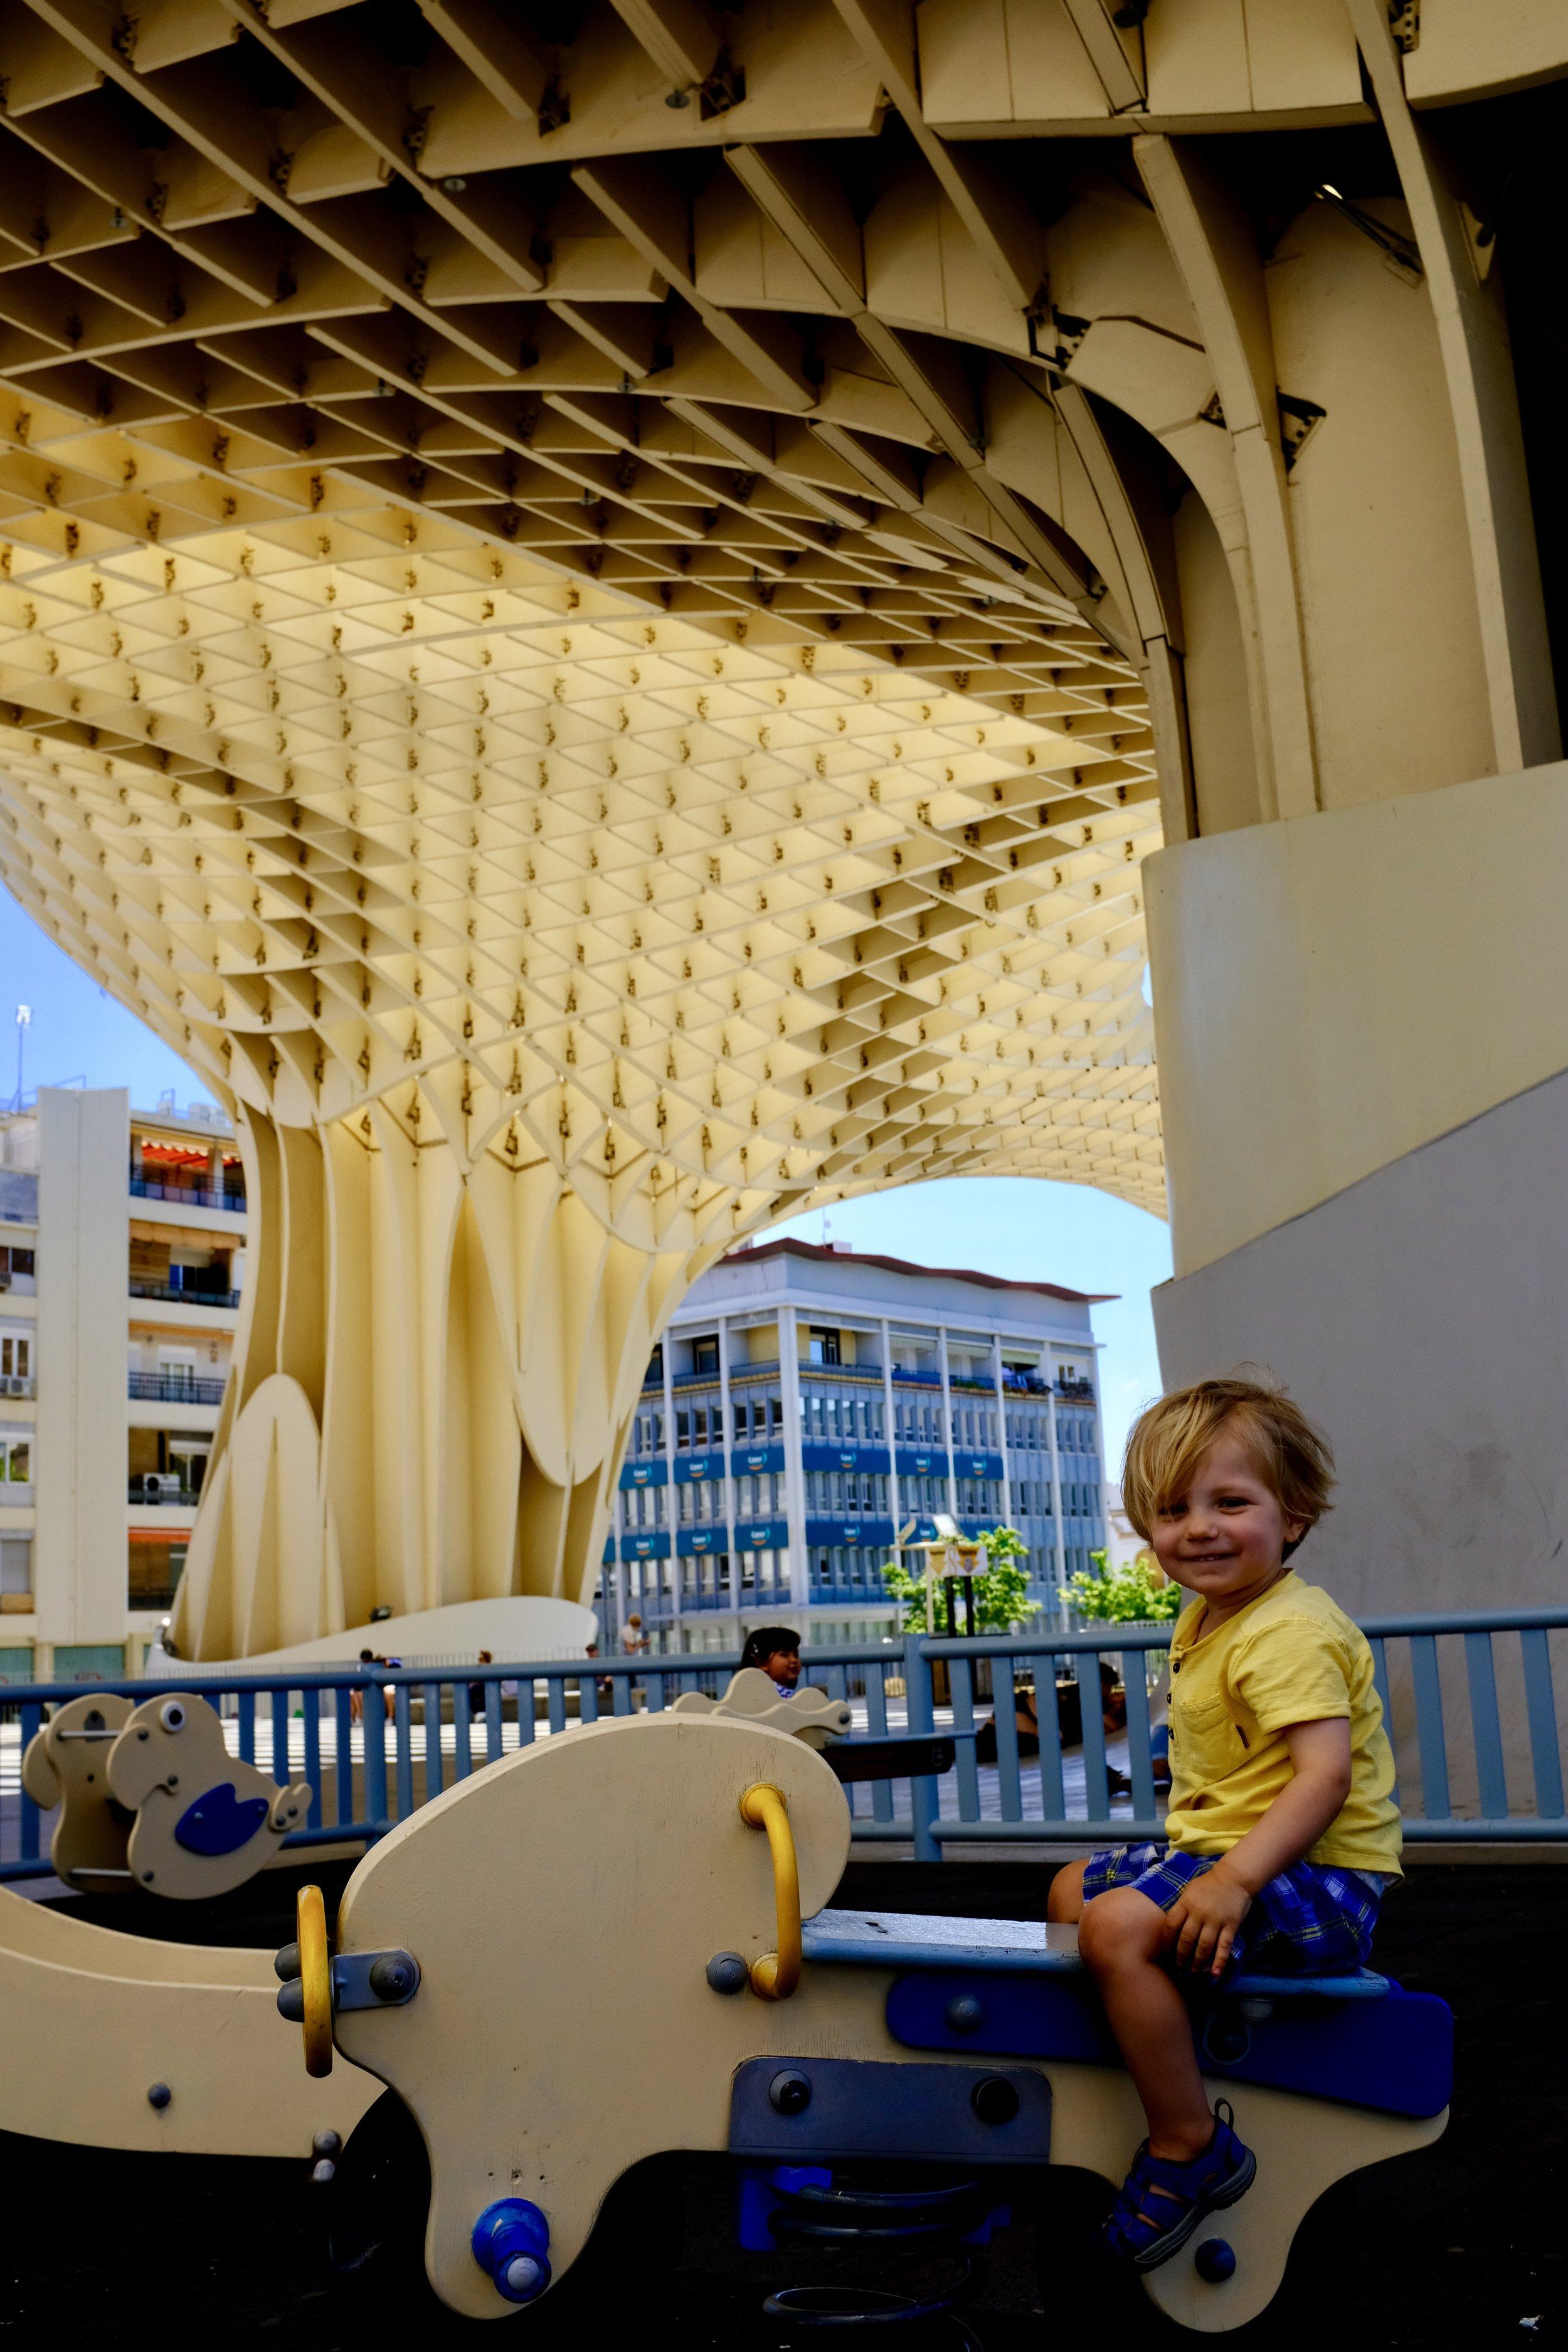 Las Setas Playground_City Nibbler_Seville